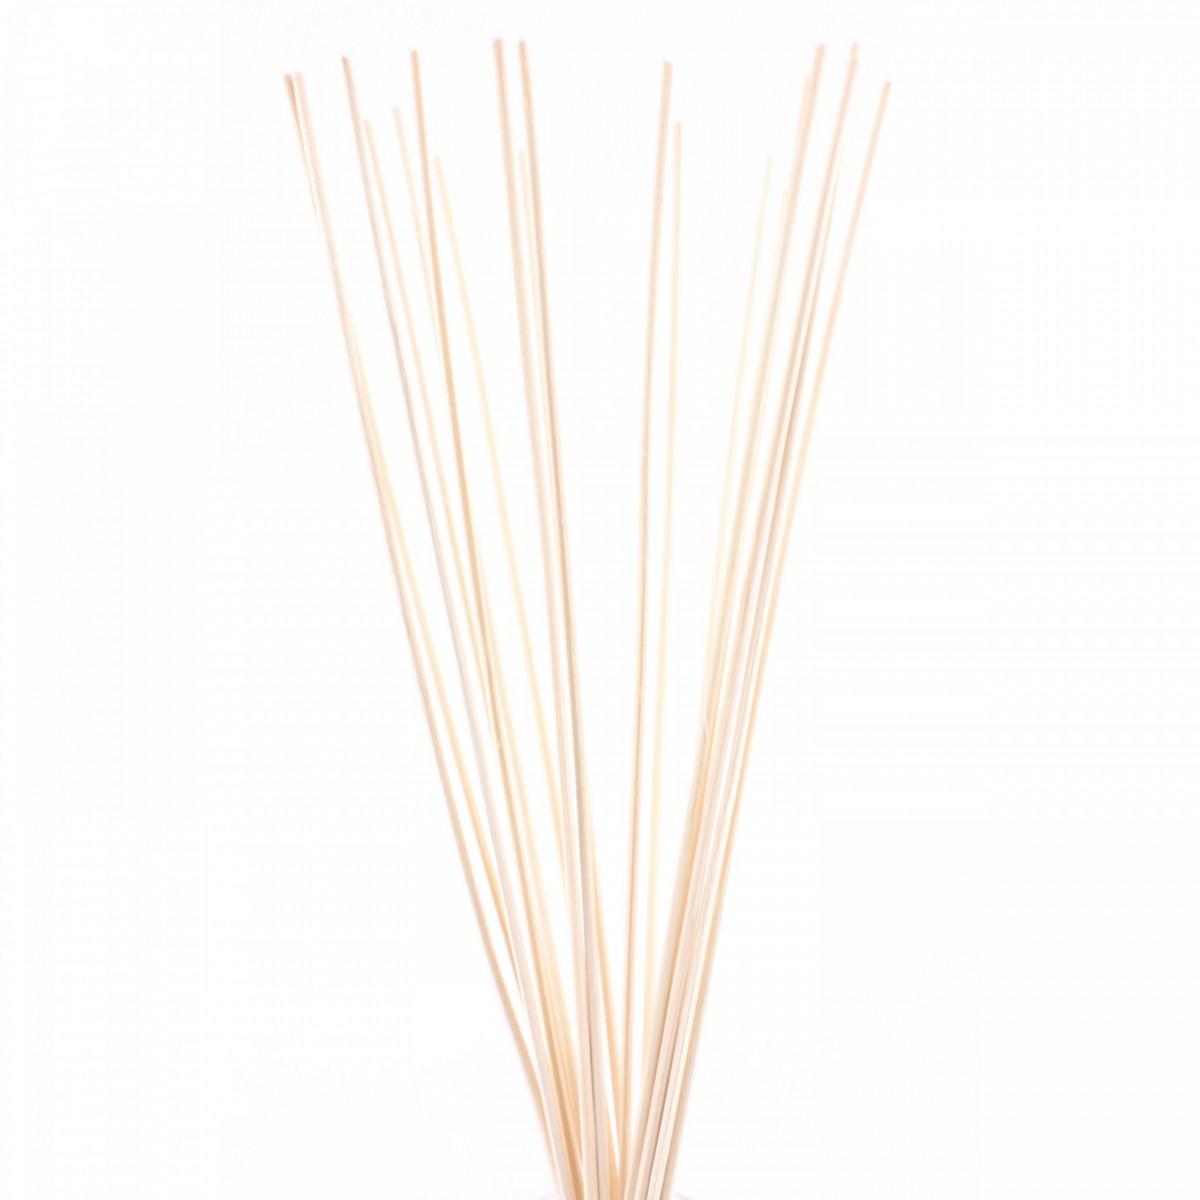 Natural-diffuser-rattan-reeds-sticks-replacement-35cm-3mm